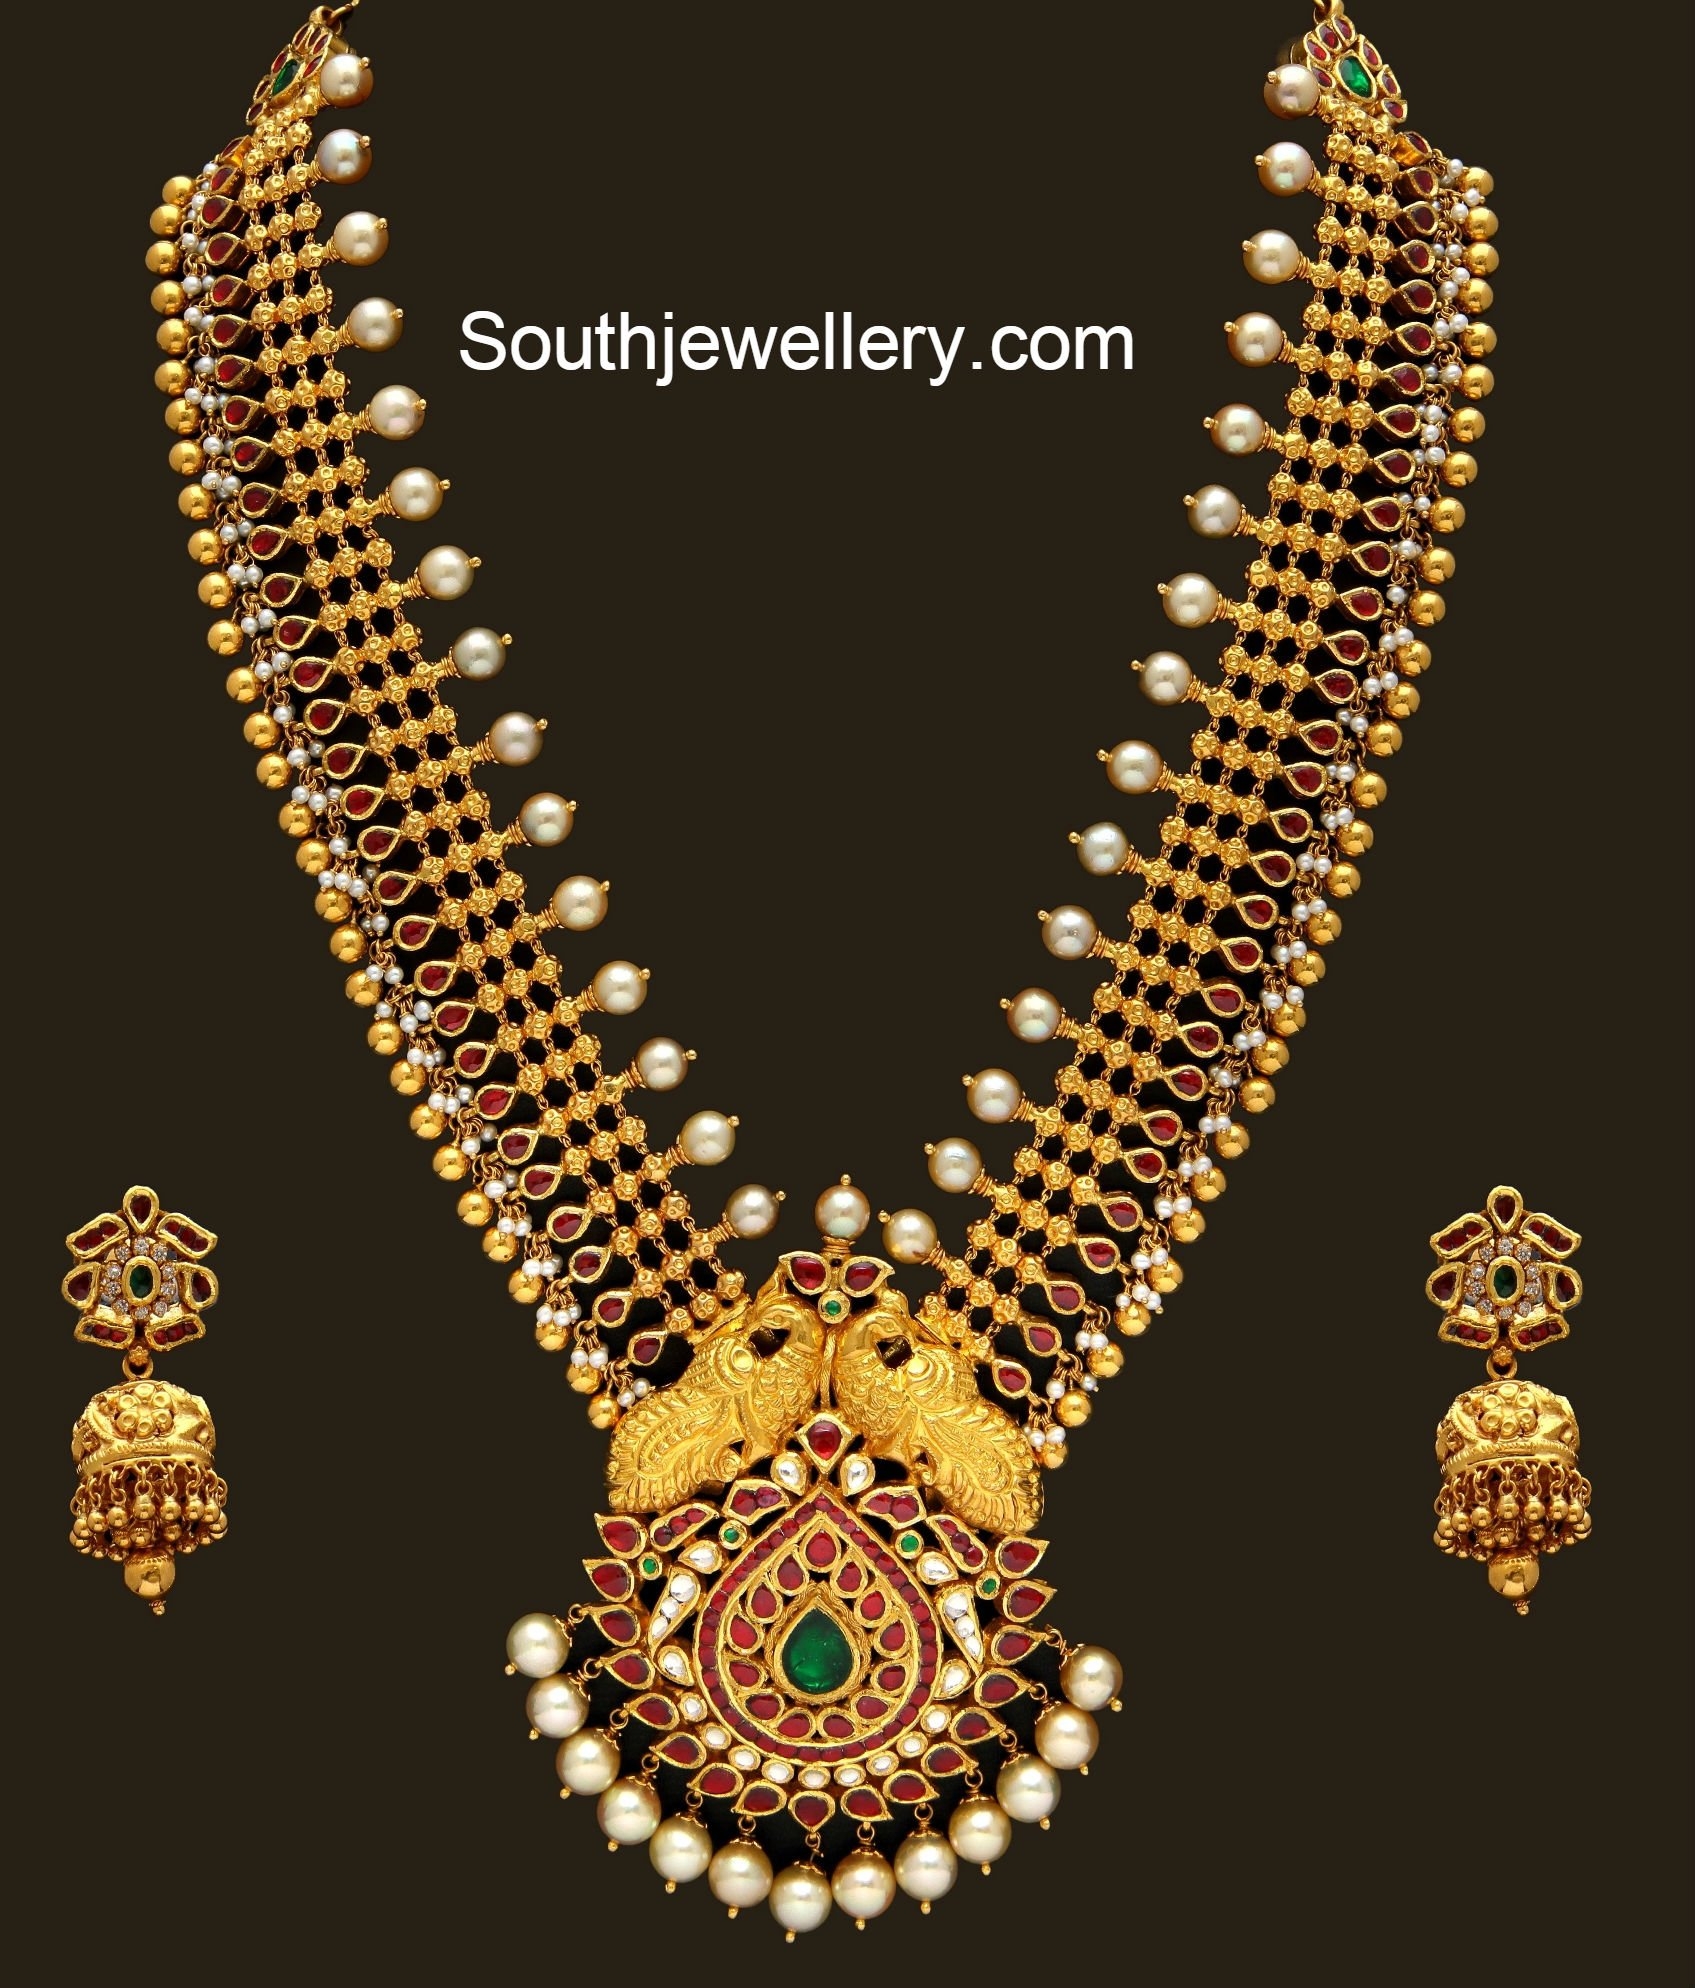 Antique Gold Haram set - Jewellery Designs